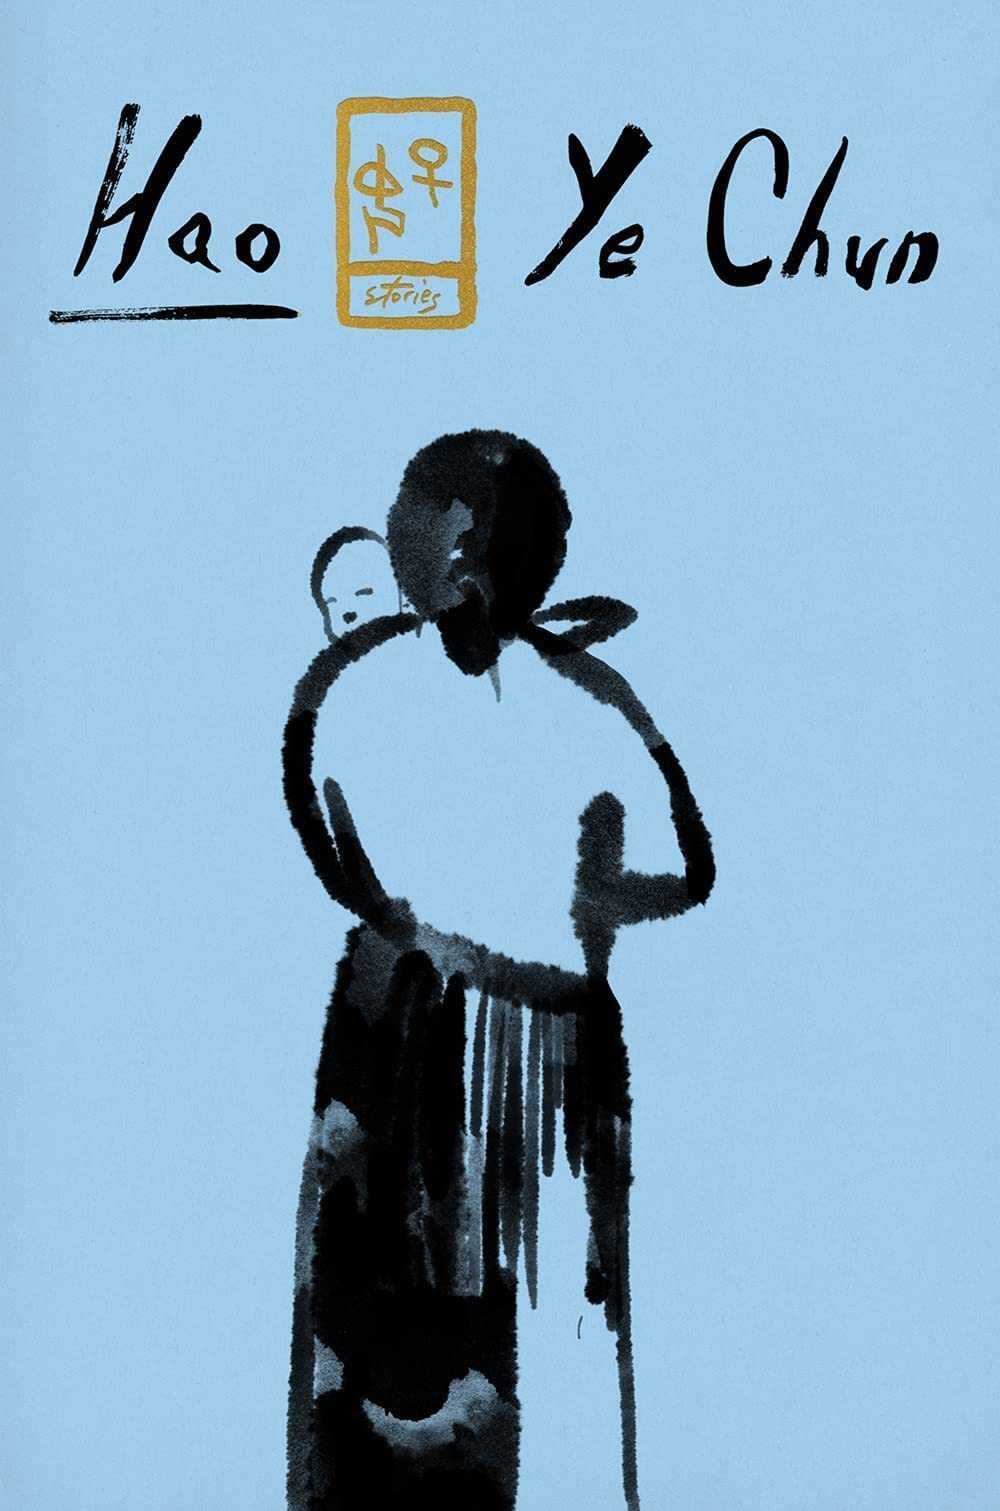 Hao, by Ye Chun